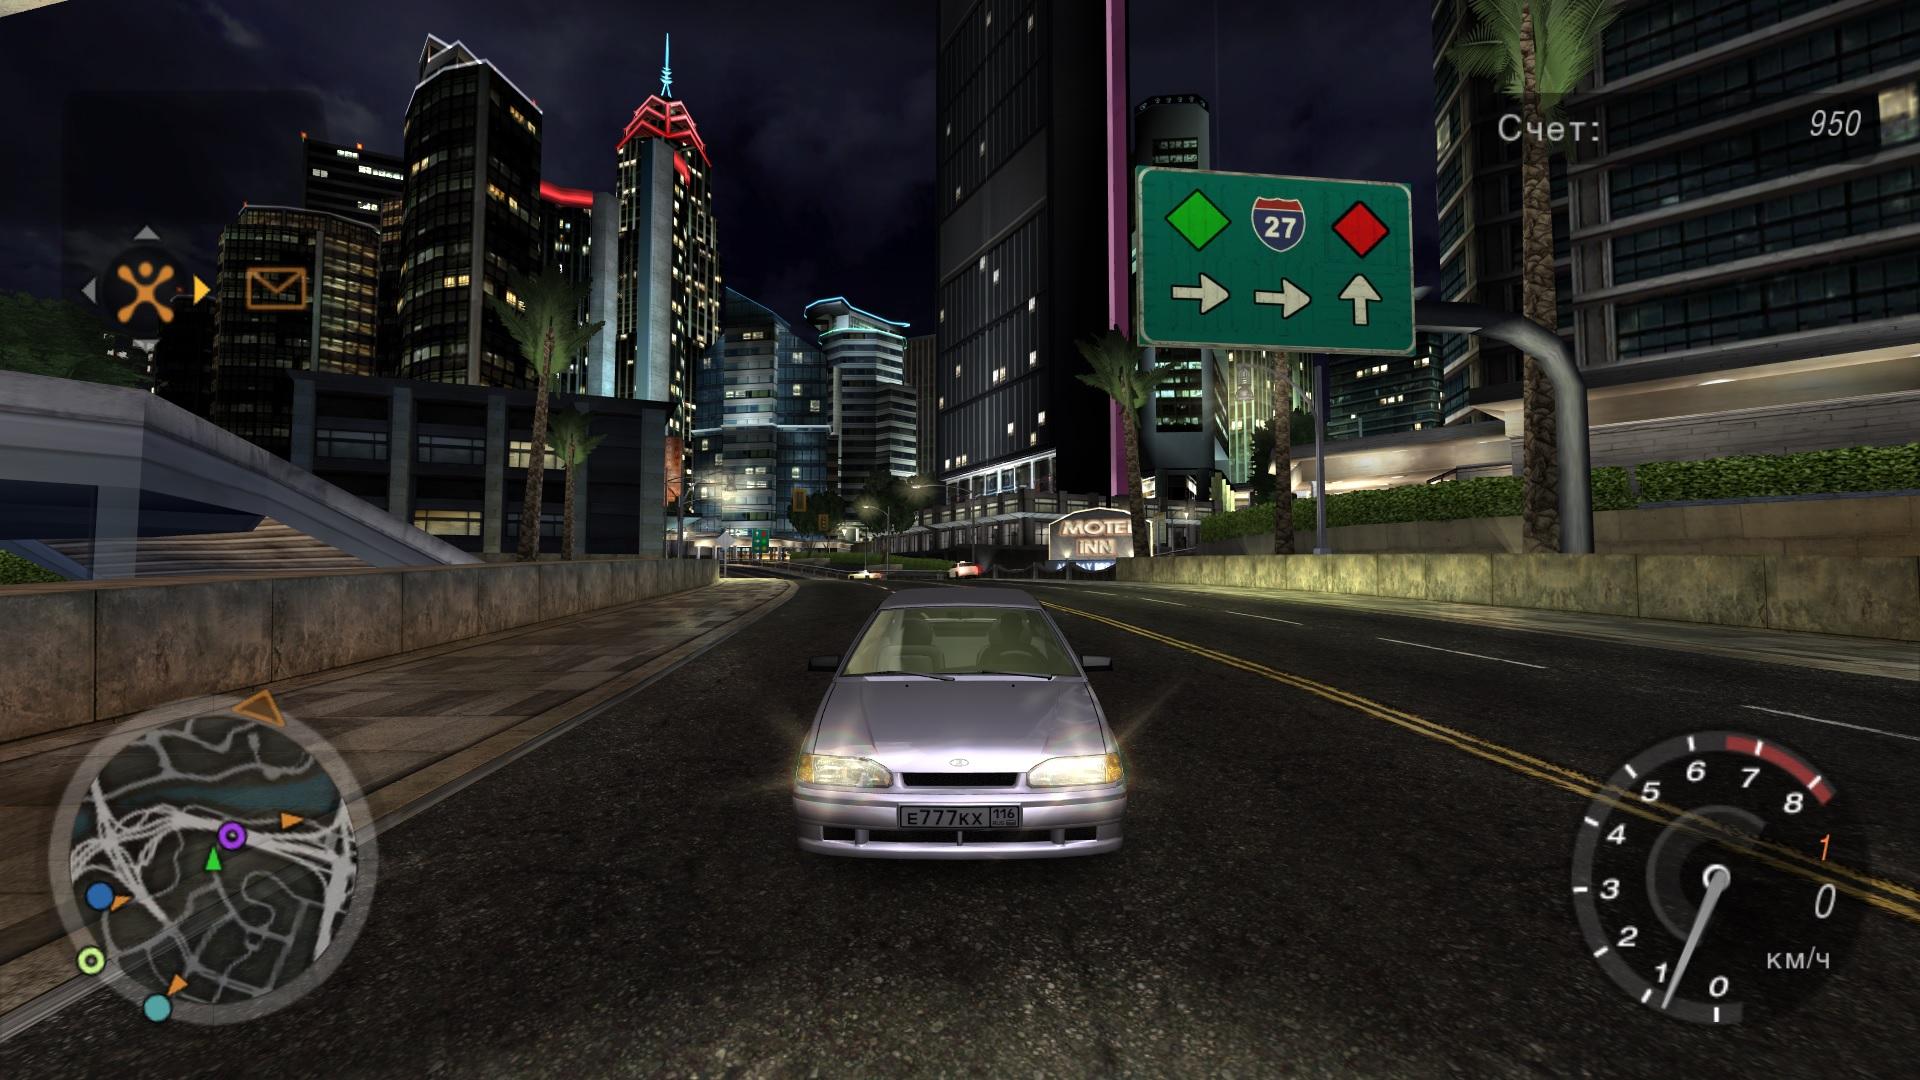 Need for Speed: Underground 2 - Need for Speed: Underground 2